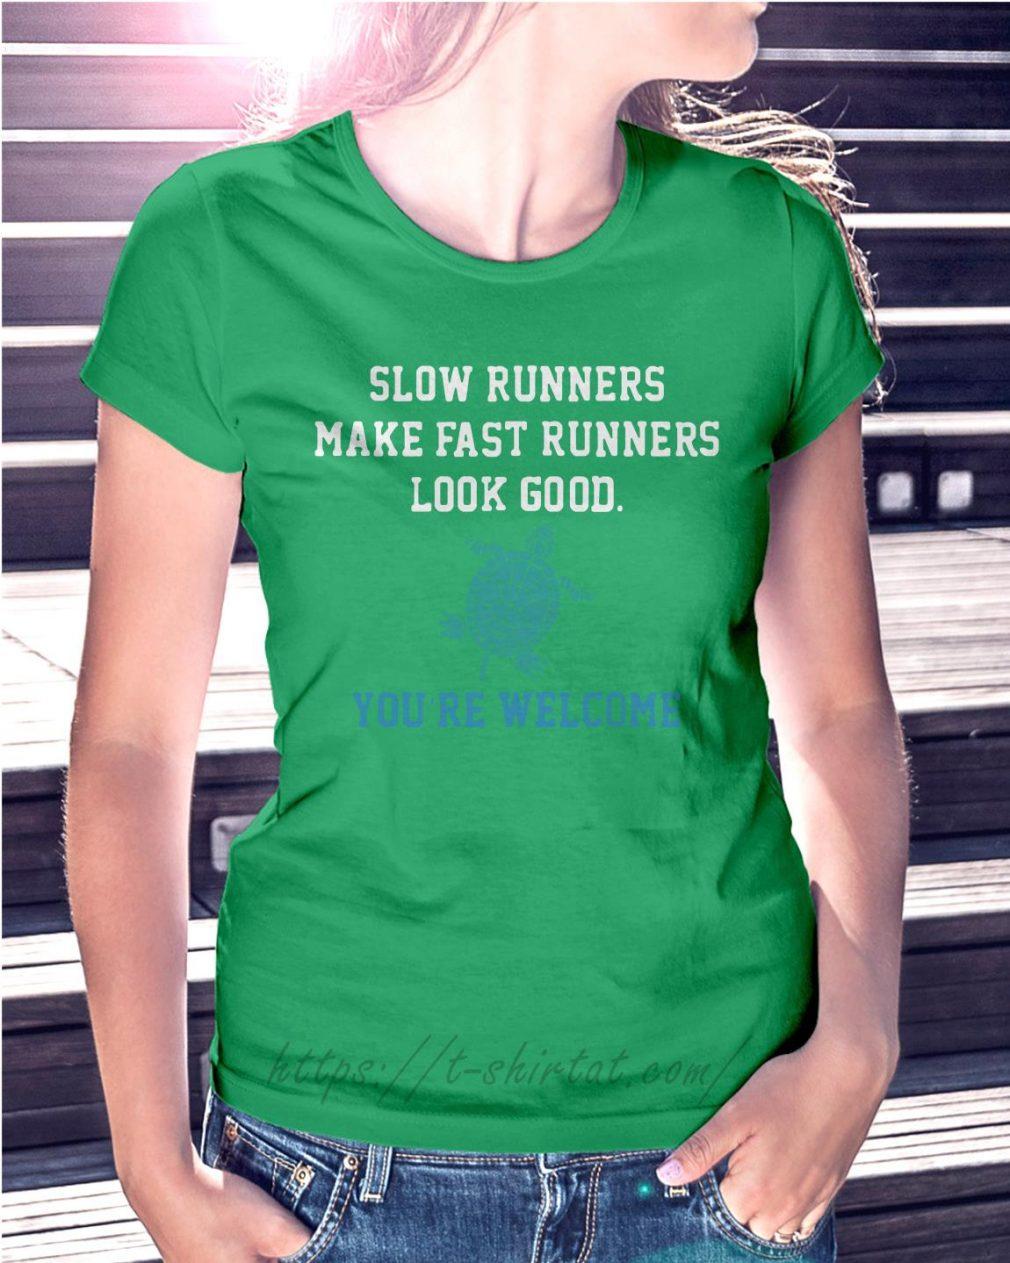 Slow runners make fast runners look good you're welcome Ladies Tee green